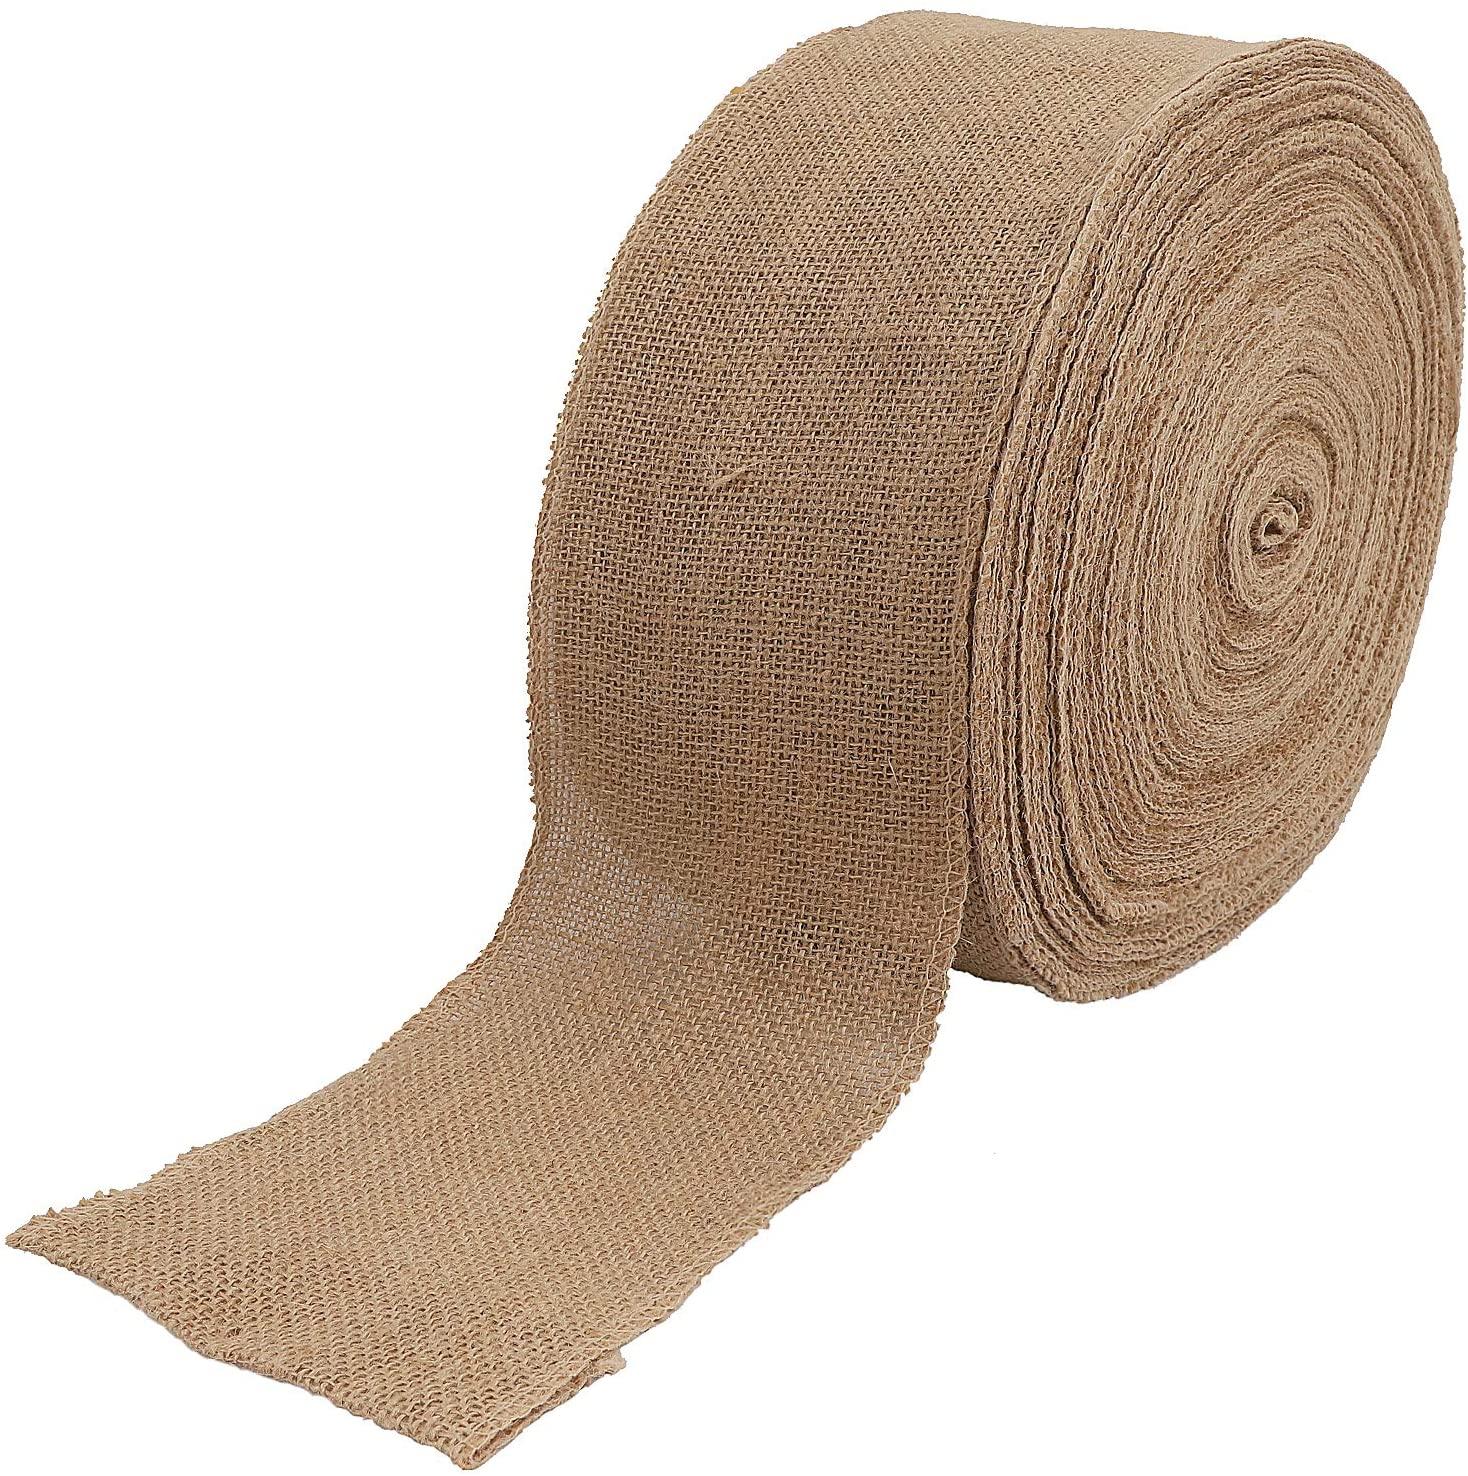 KINJOEK 5 Inch Wide 54 Yards Burlap Ribbon, Natural Jute Fabric Ribbon Crafts Ribbon for Christmas Wedding Gifts Burlap Fabric DIY Ribbon for Decoration